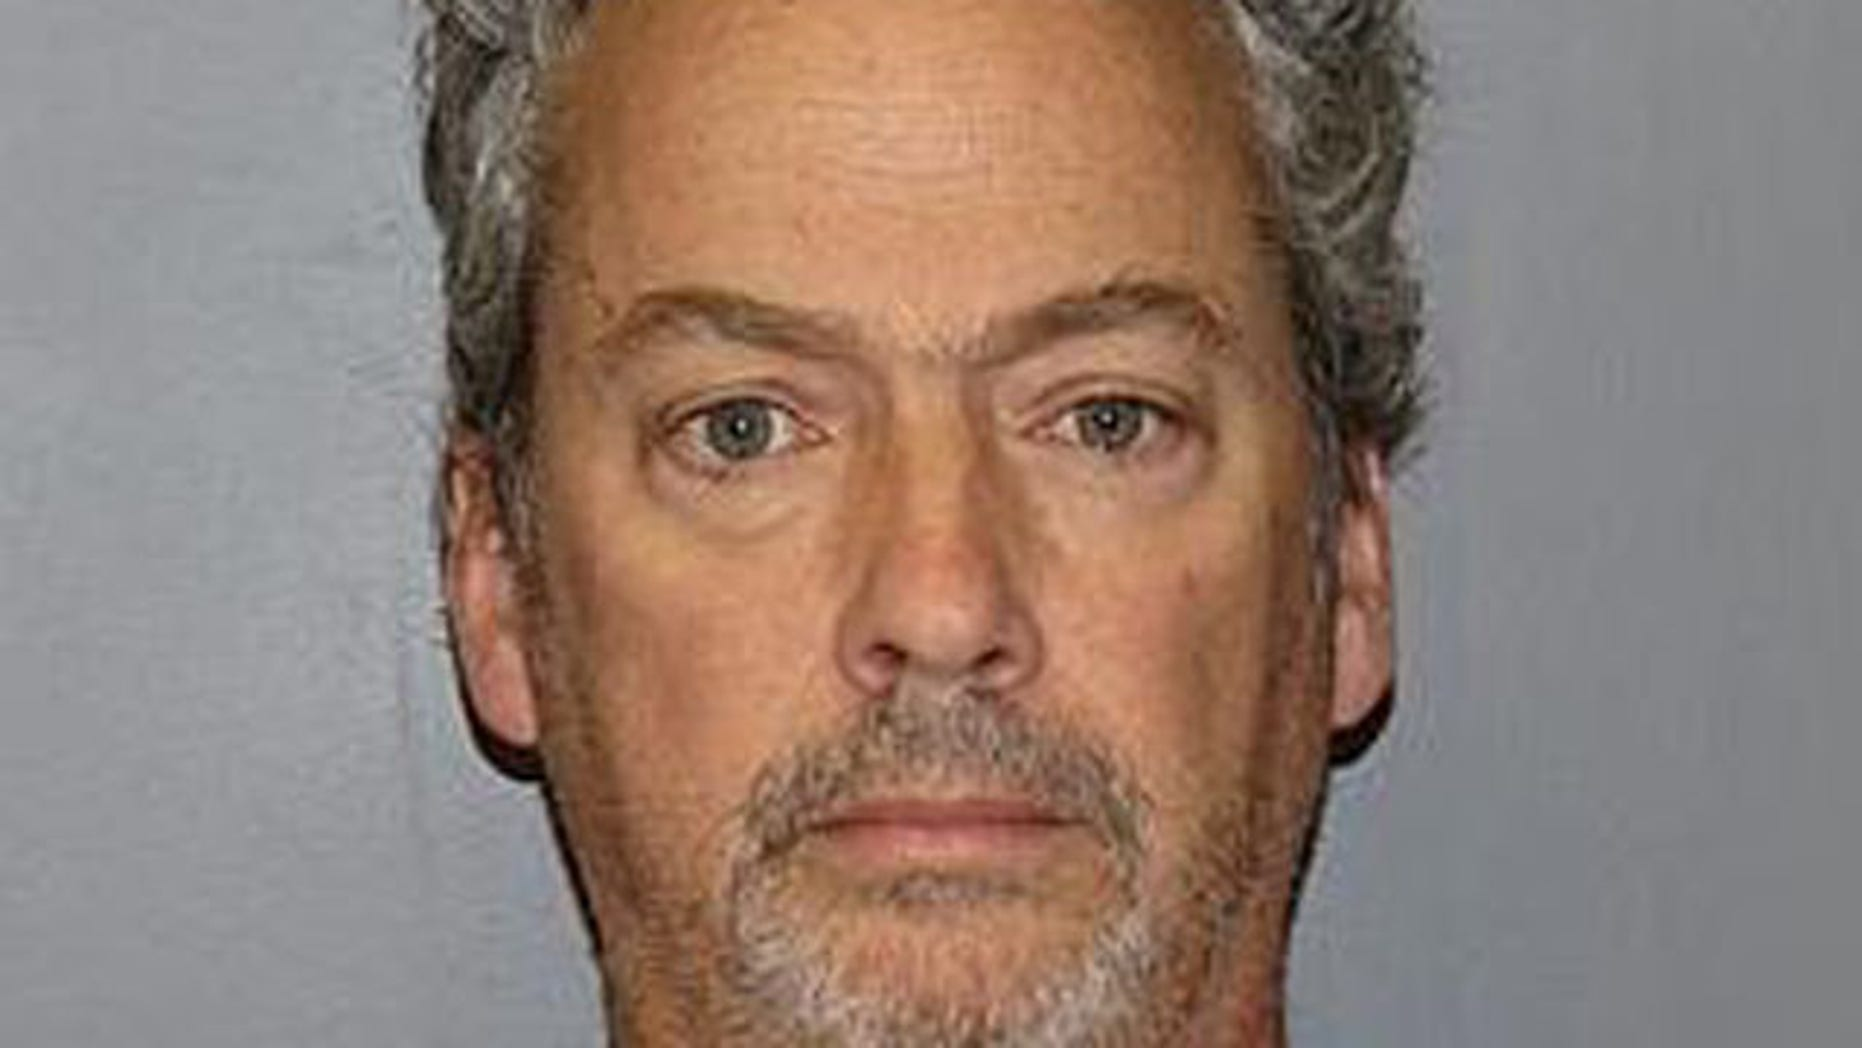 Patrick J. Lott is accused of videotaping boys showering at Bernardsville Middle School.